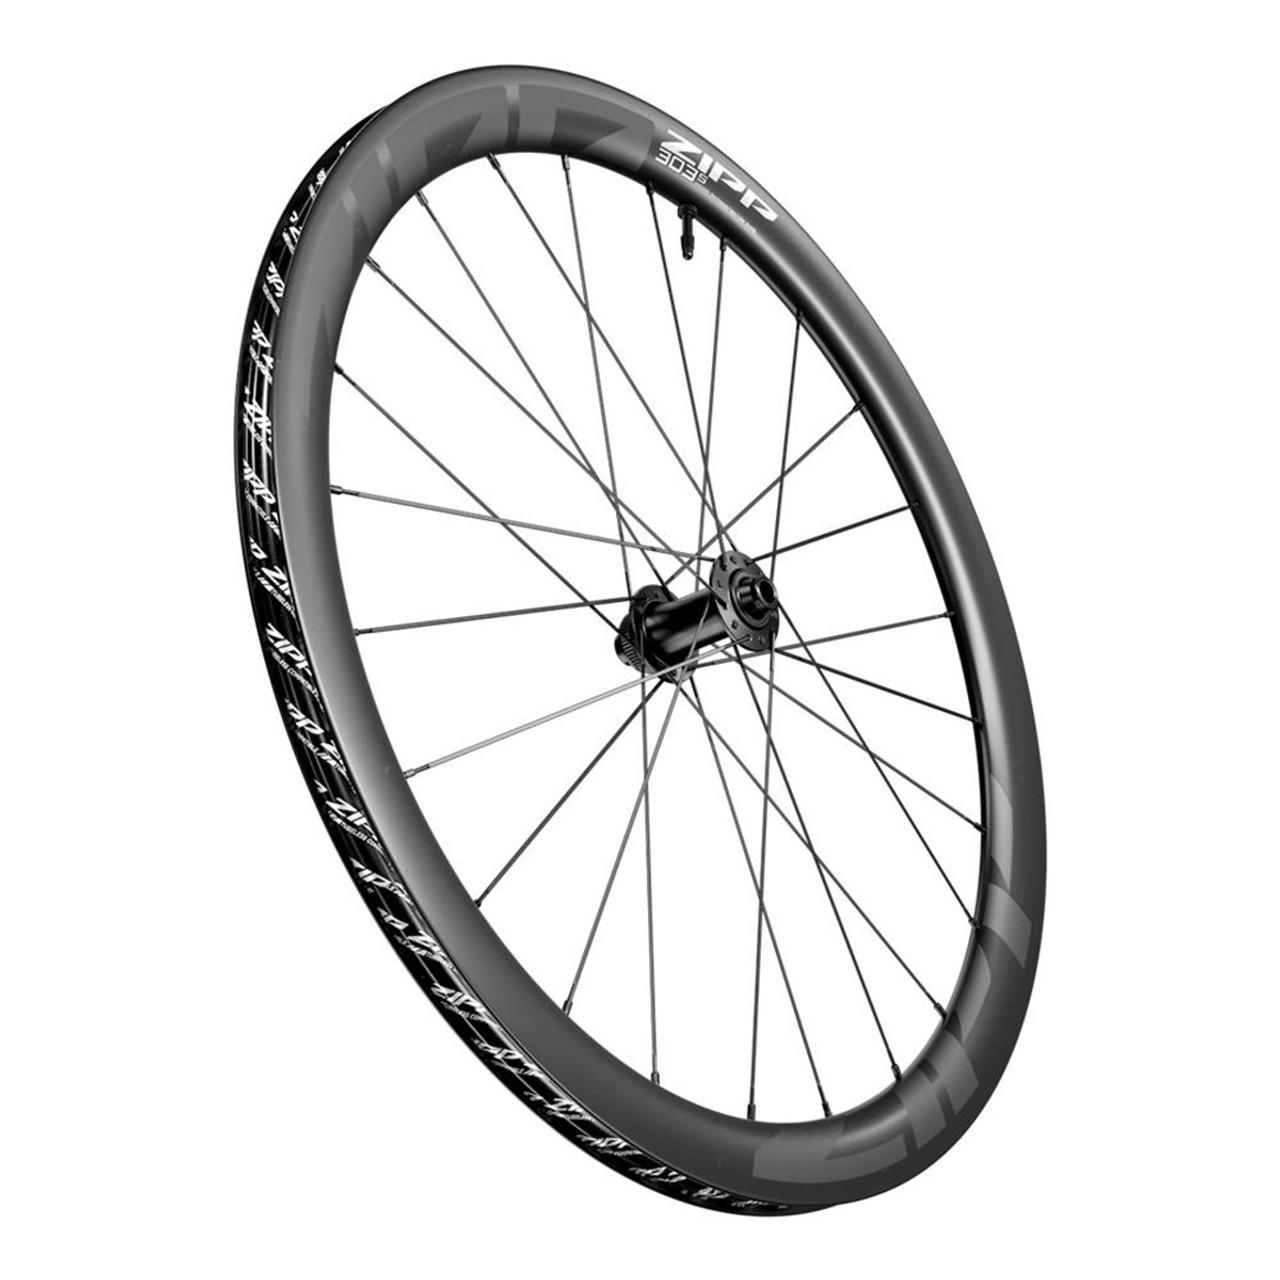 ZIPP 303 S Carbon Tubeless Ready Disc Brake Center Lockring 700C Front Wheel 24Spokes 12 X 100mm A1